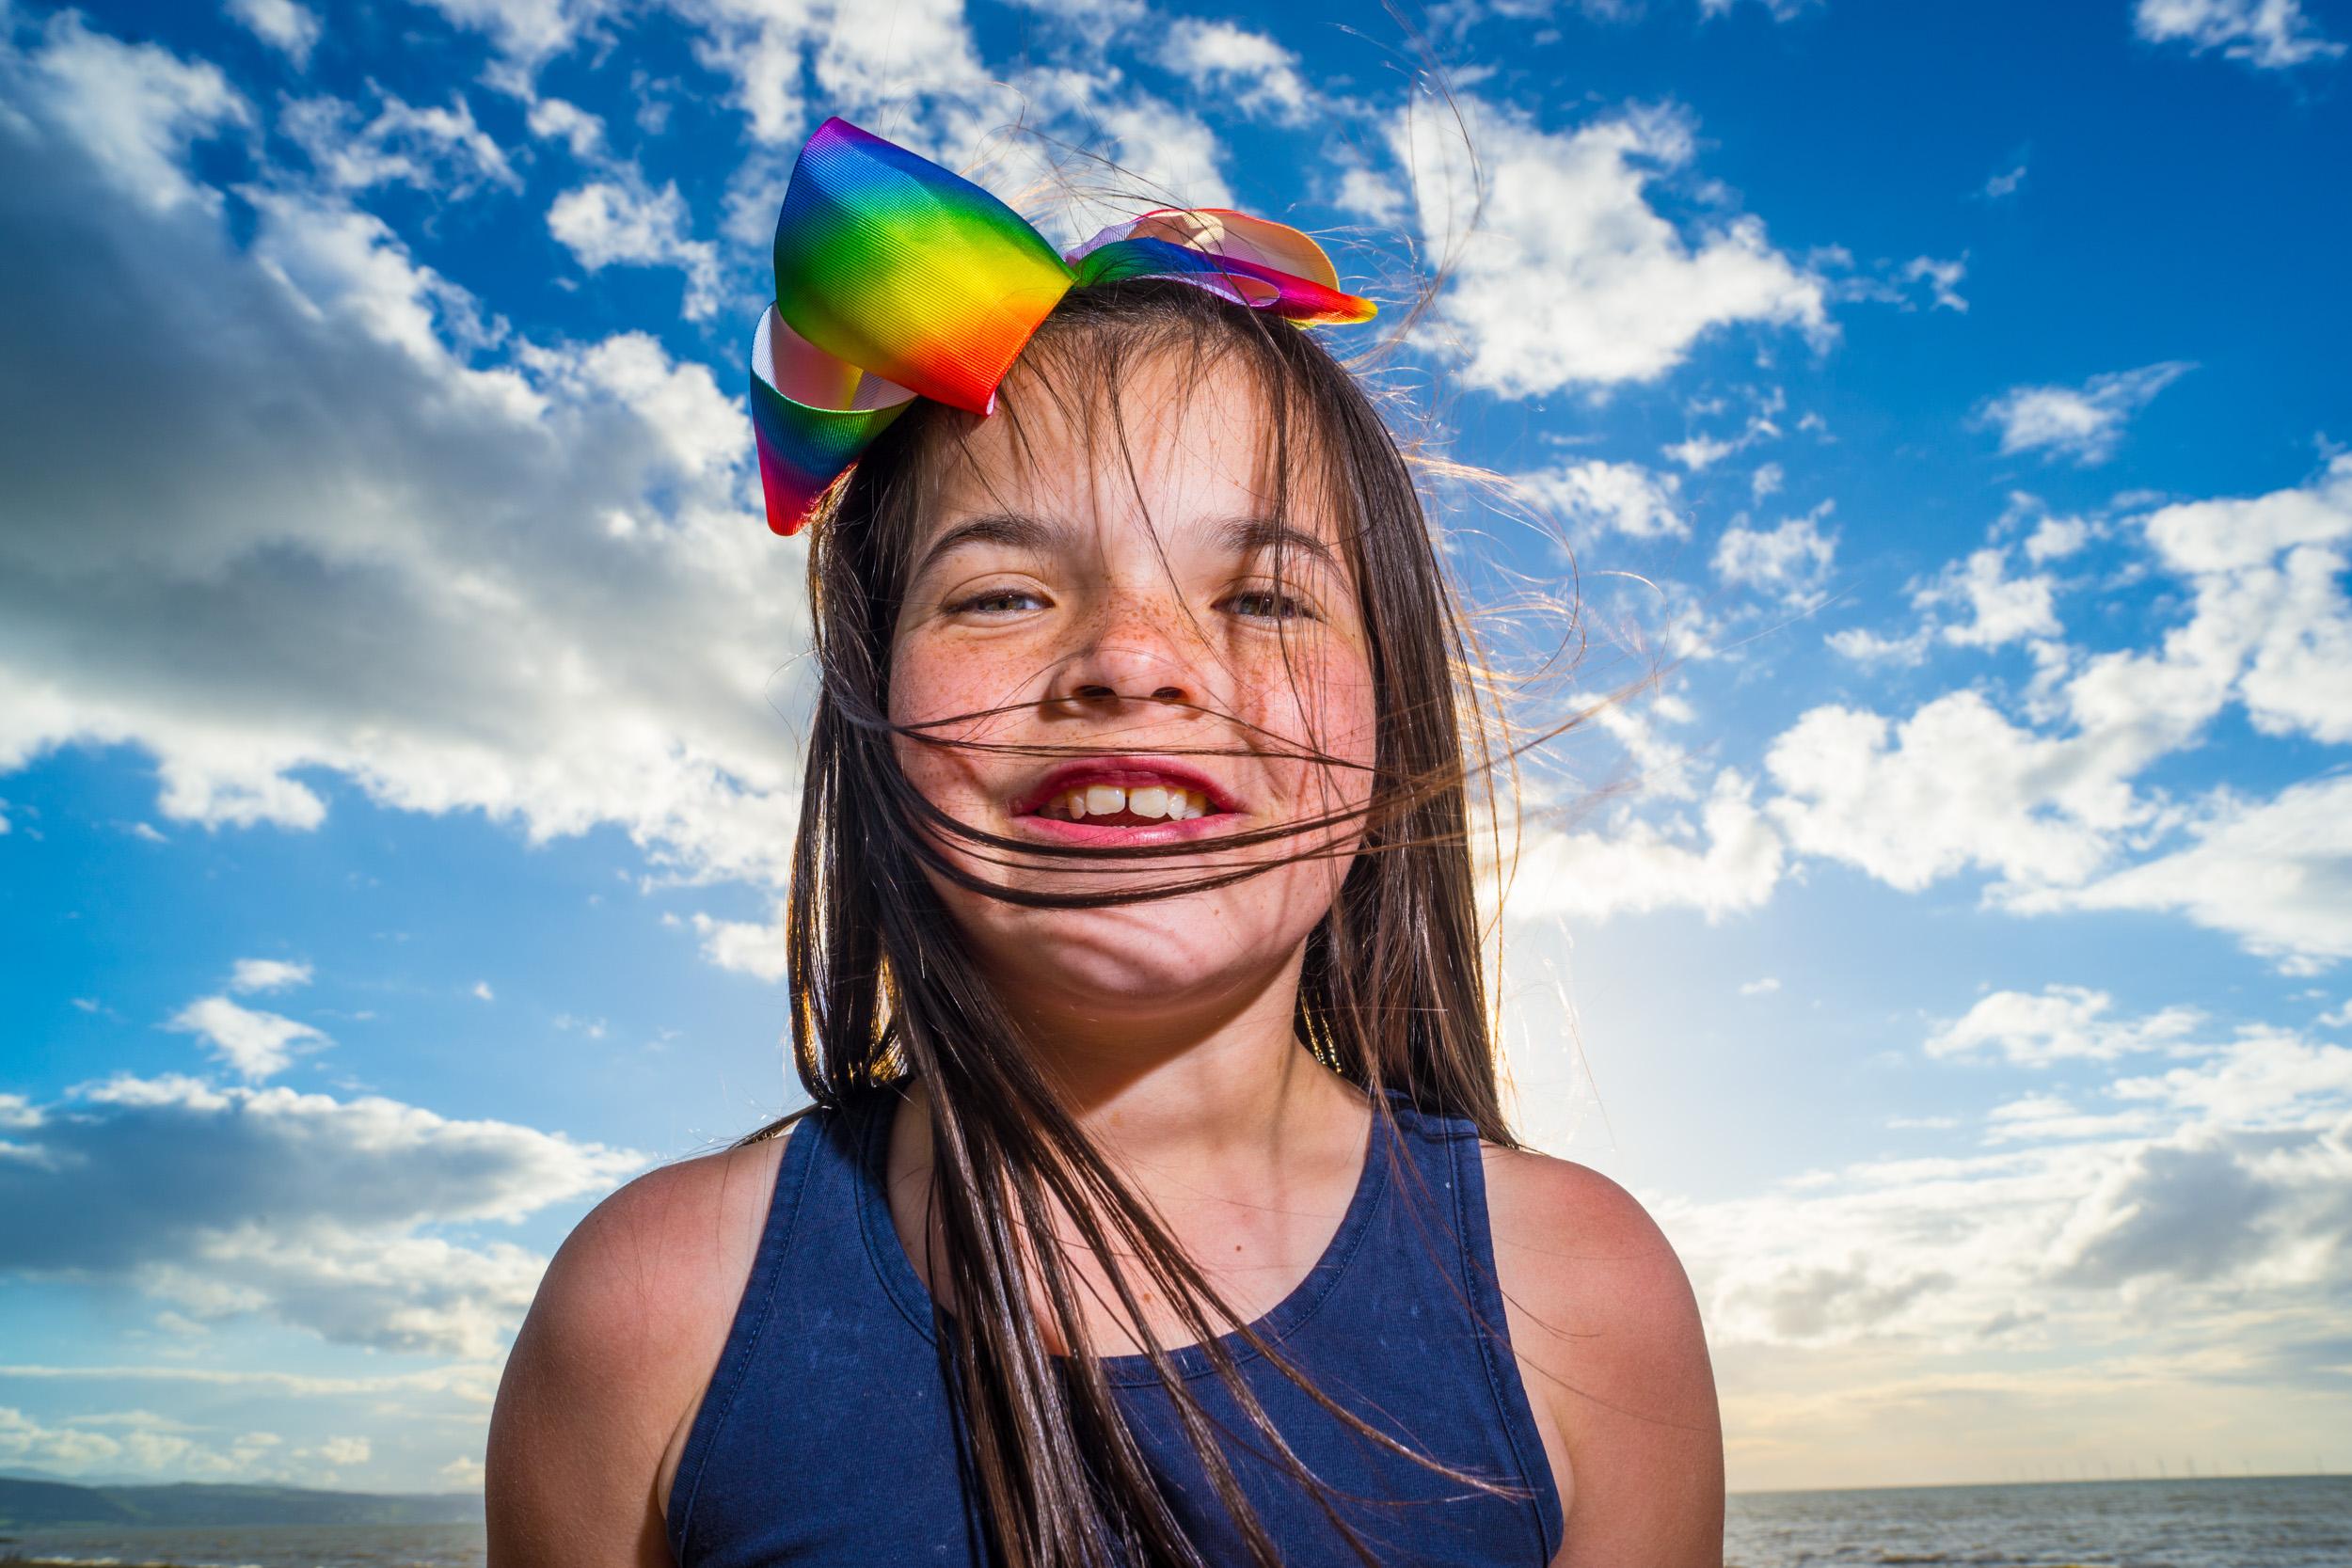 Amanda, Kinmel Bay beach, Family shoot.